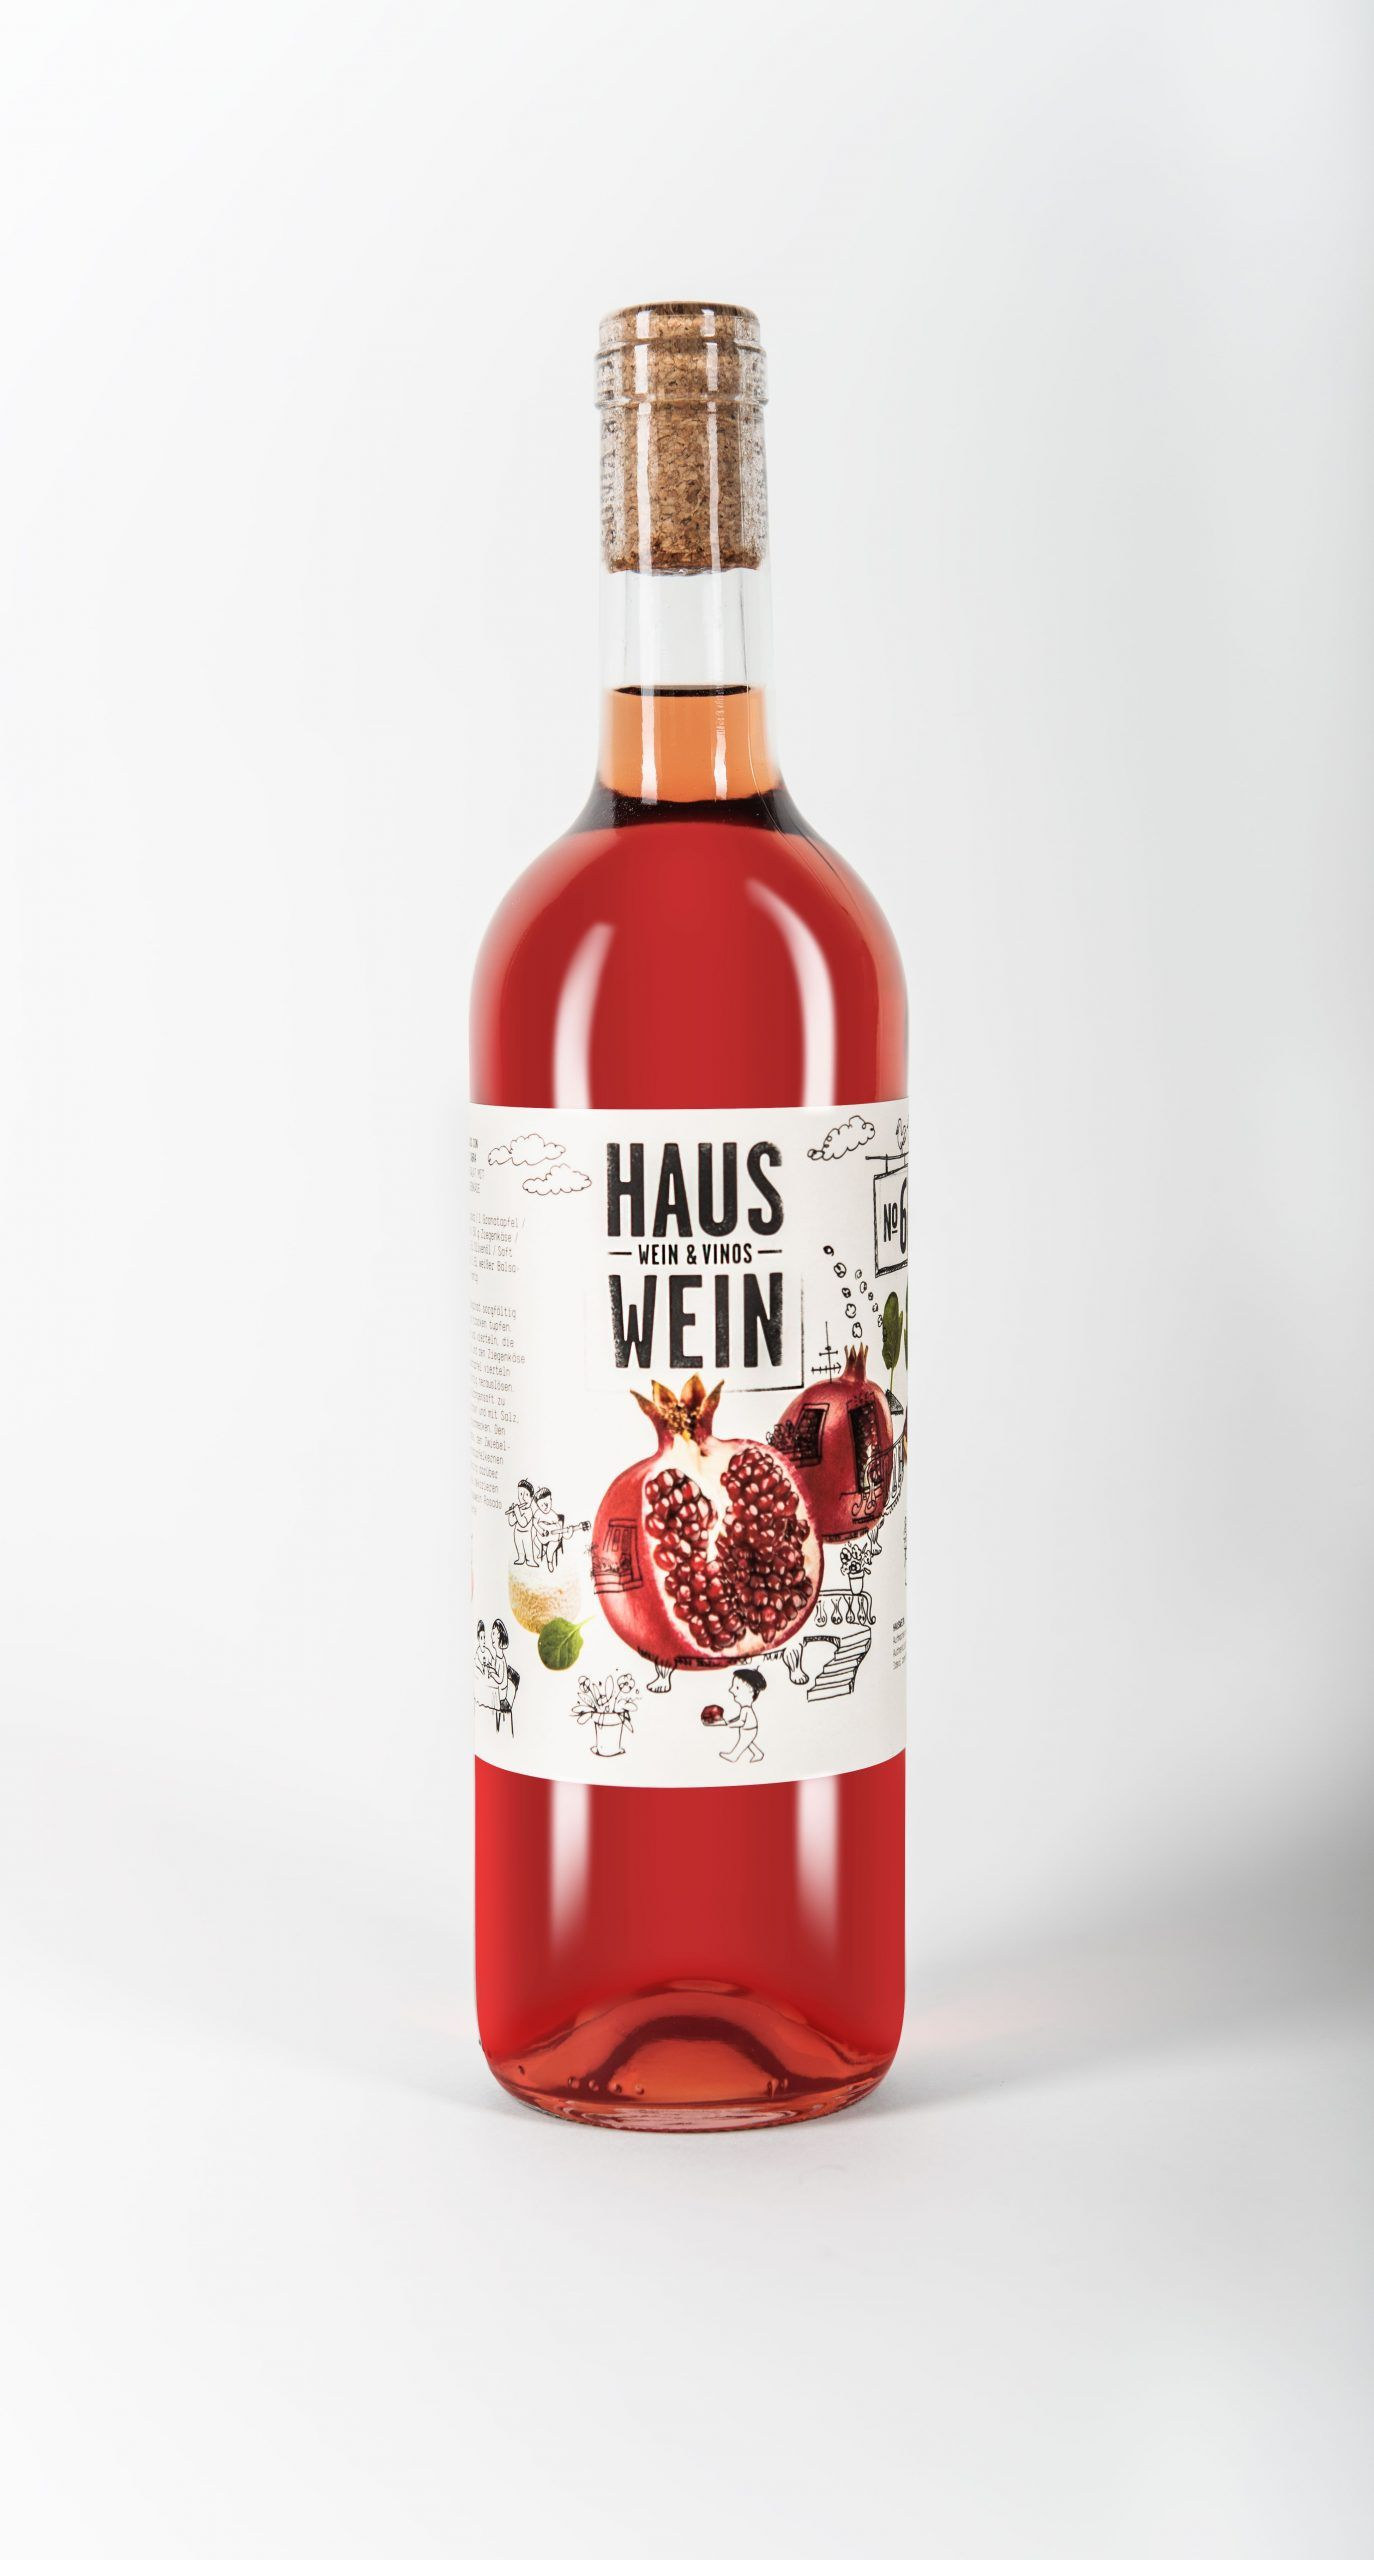 Haus Wein Packaging Design By Ruska Martin Associates See More At Ruskamarti Associates Design Haus Martin Packaging Ruska Ruskamarti Wein In 2020